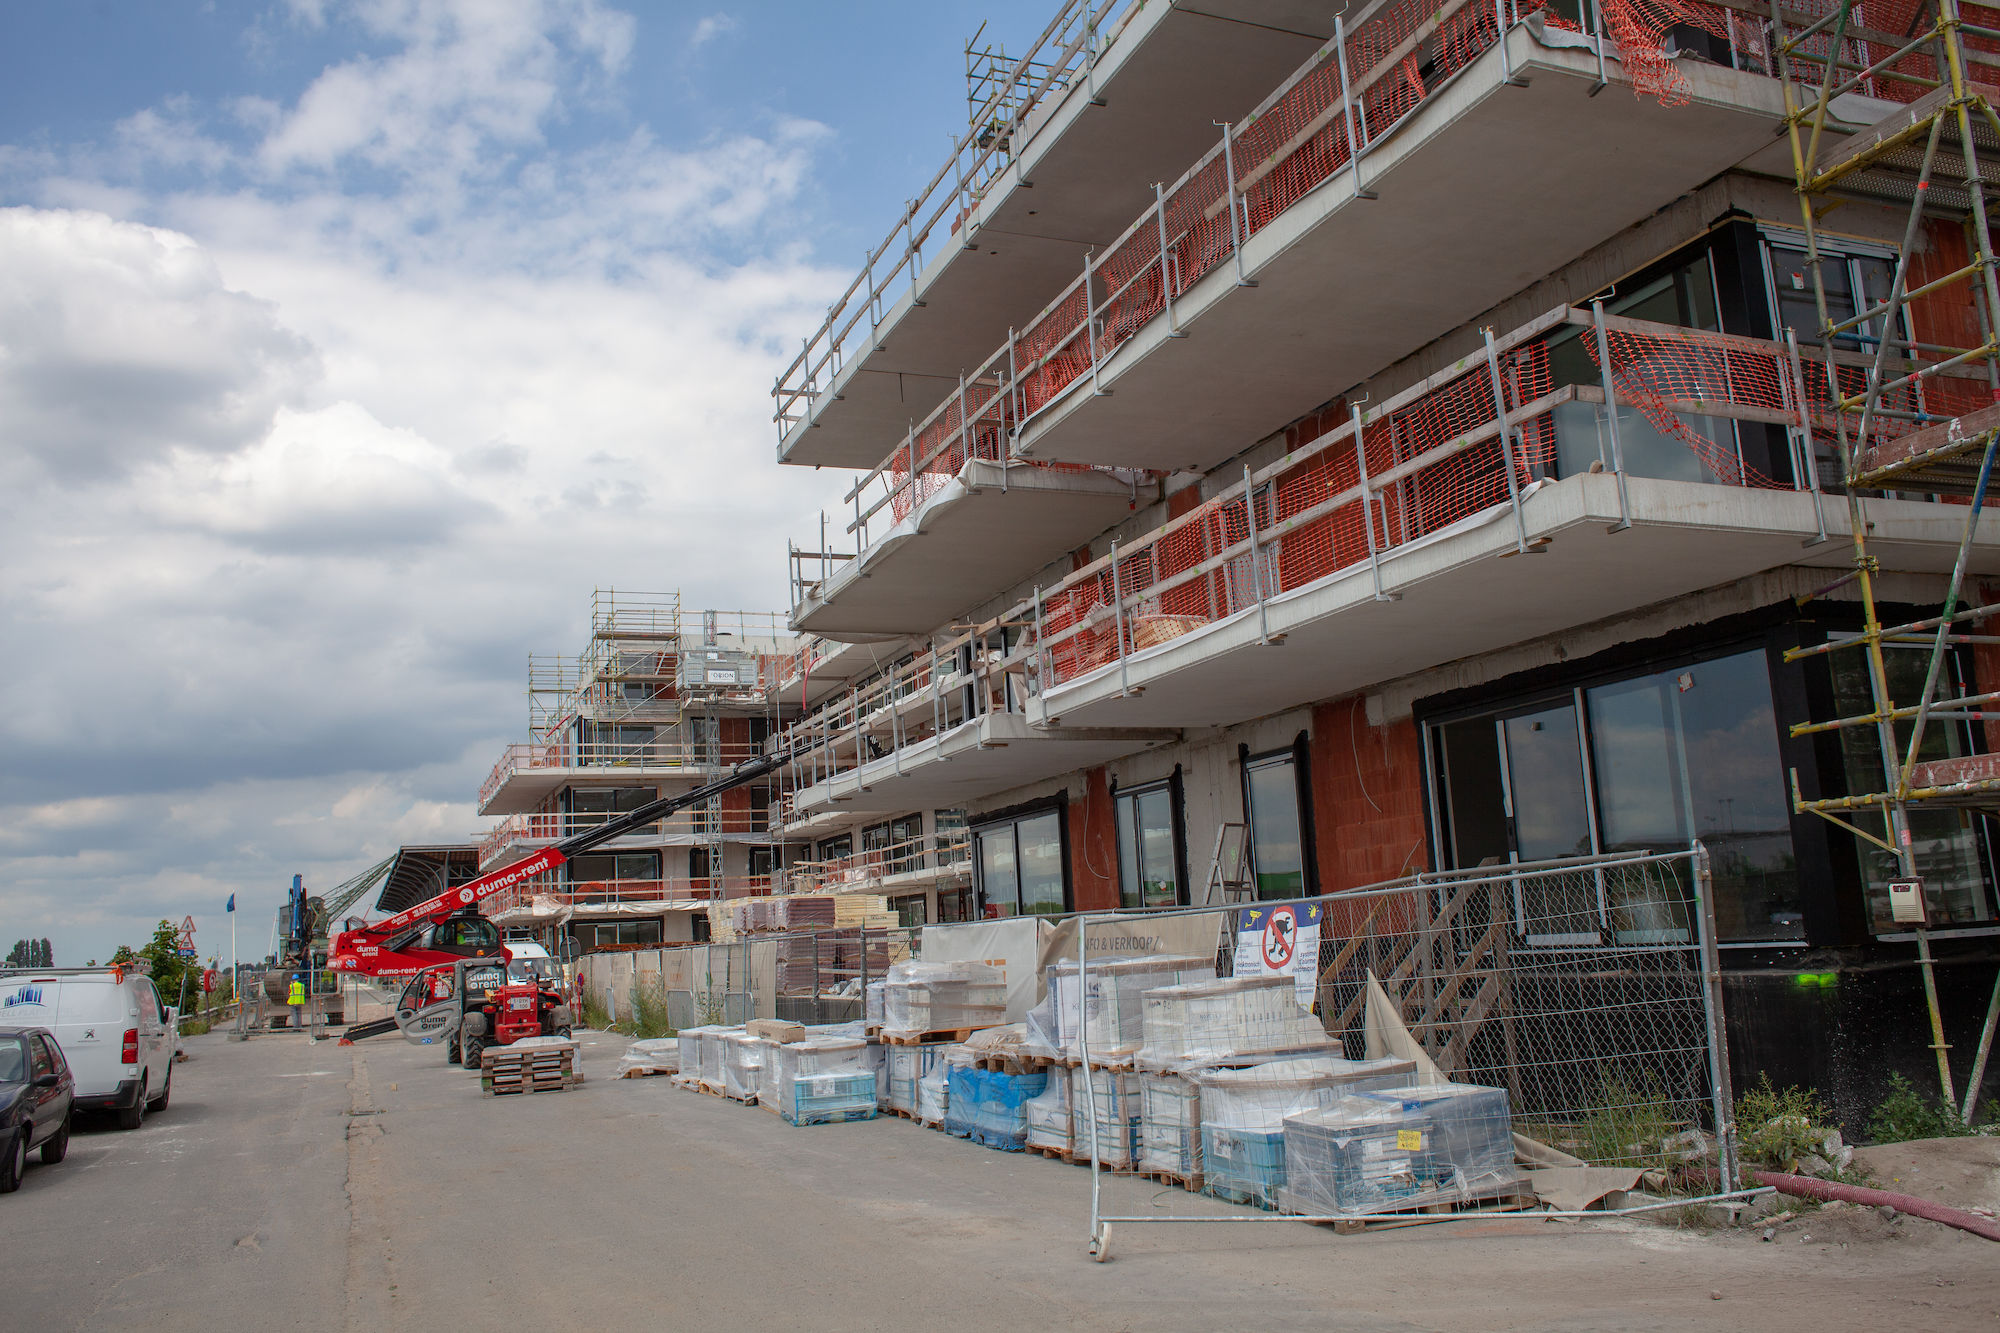 2019-07-02 Muide Meulestede prospectie Wannes_stadsvernieuwing_IMG_0424-3.jpg